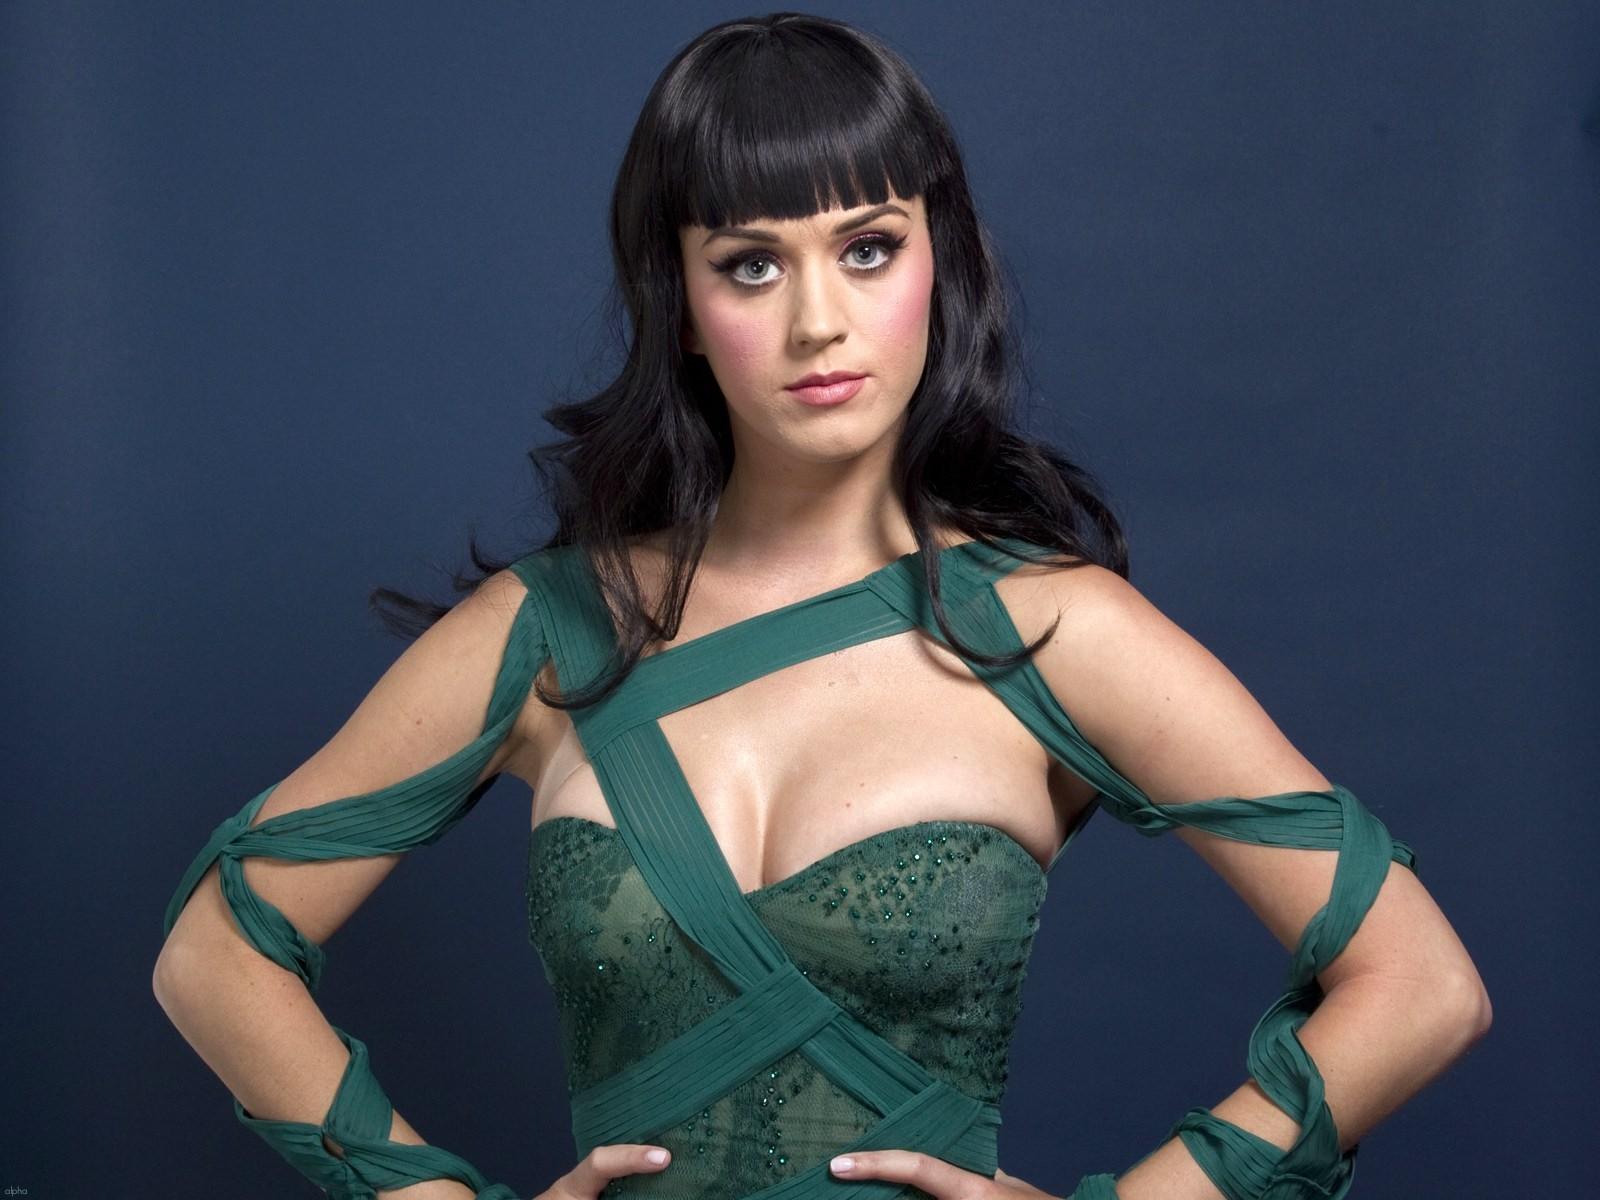 Katy Perry Wallpaper